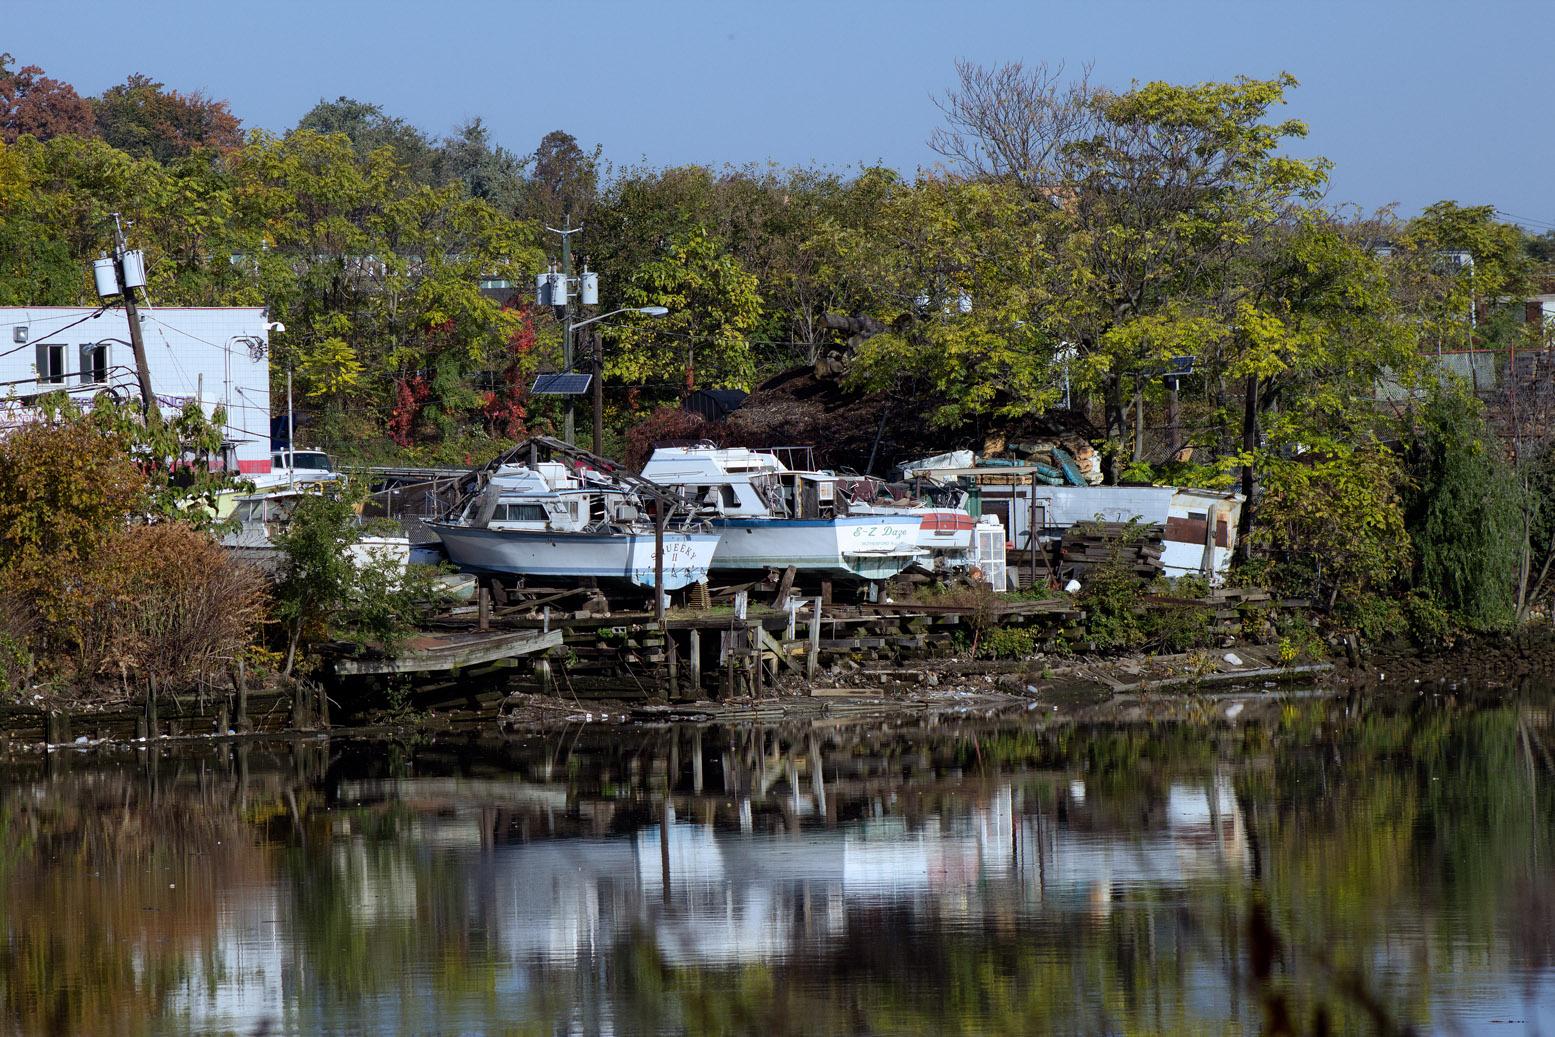 https://easy-exposure.com/wp-content/uploads/2012/10/xuwfm-boathouse.jpg